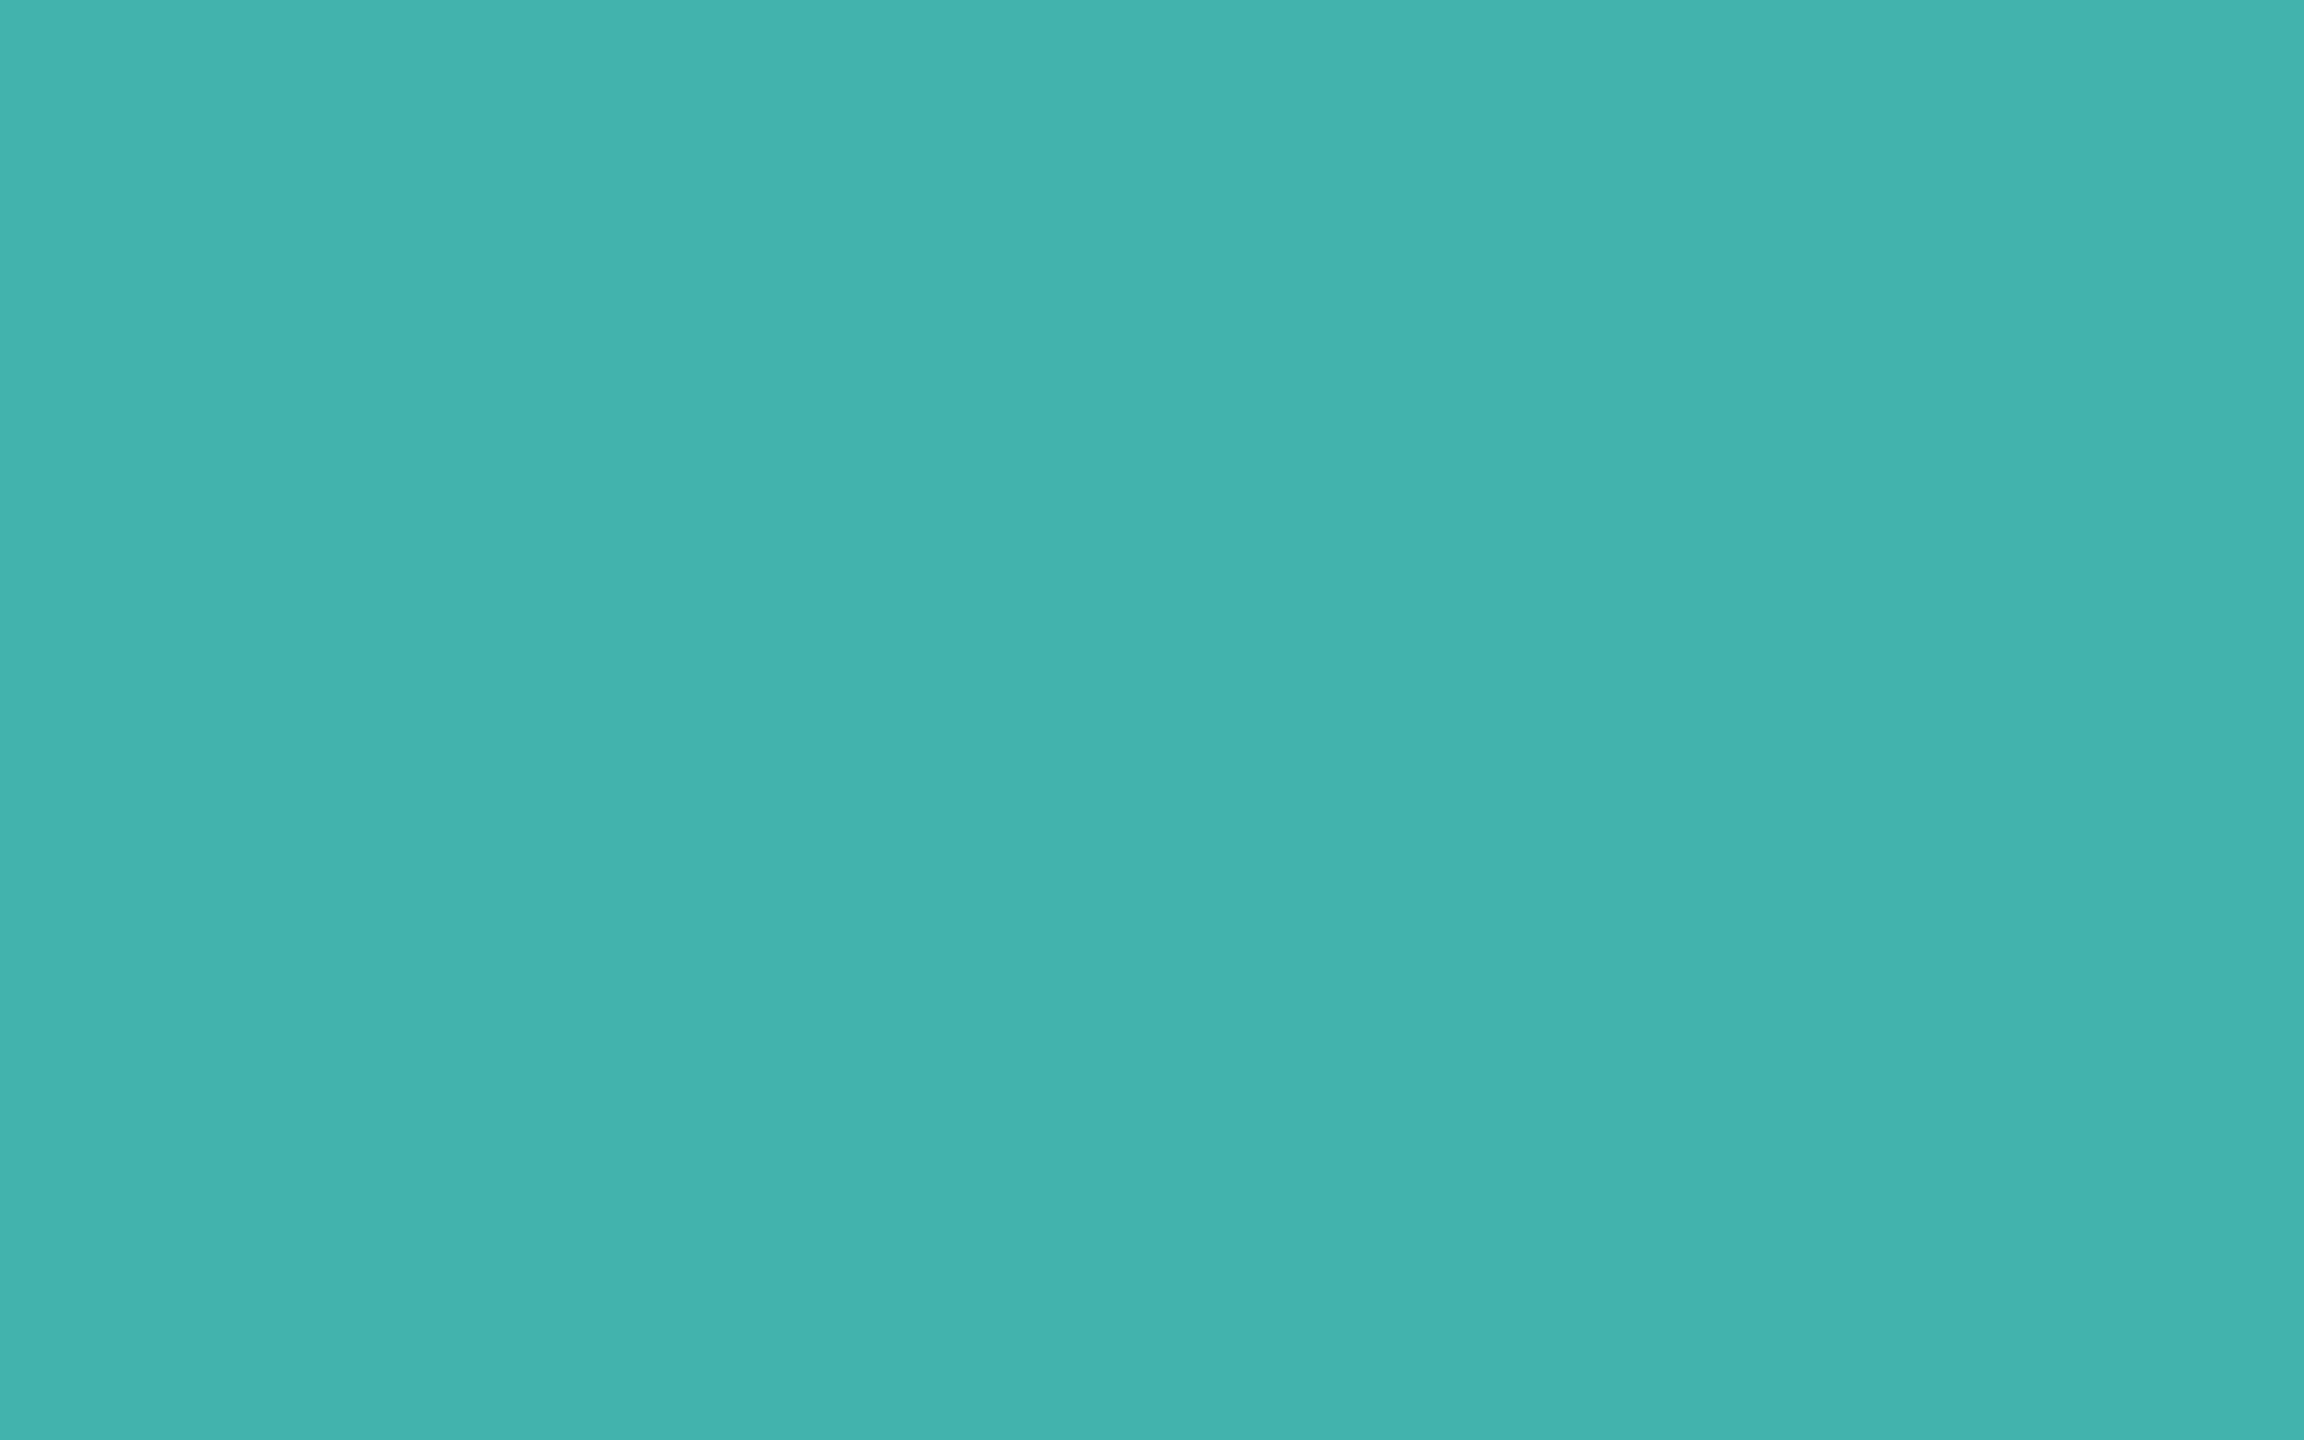 2304x1440 Verdigris Solid Color Background